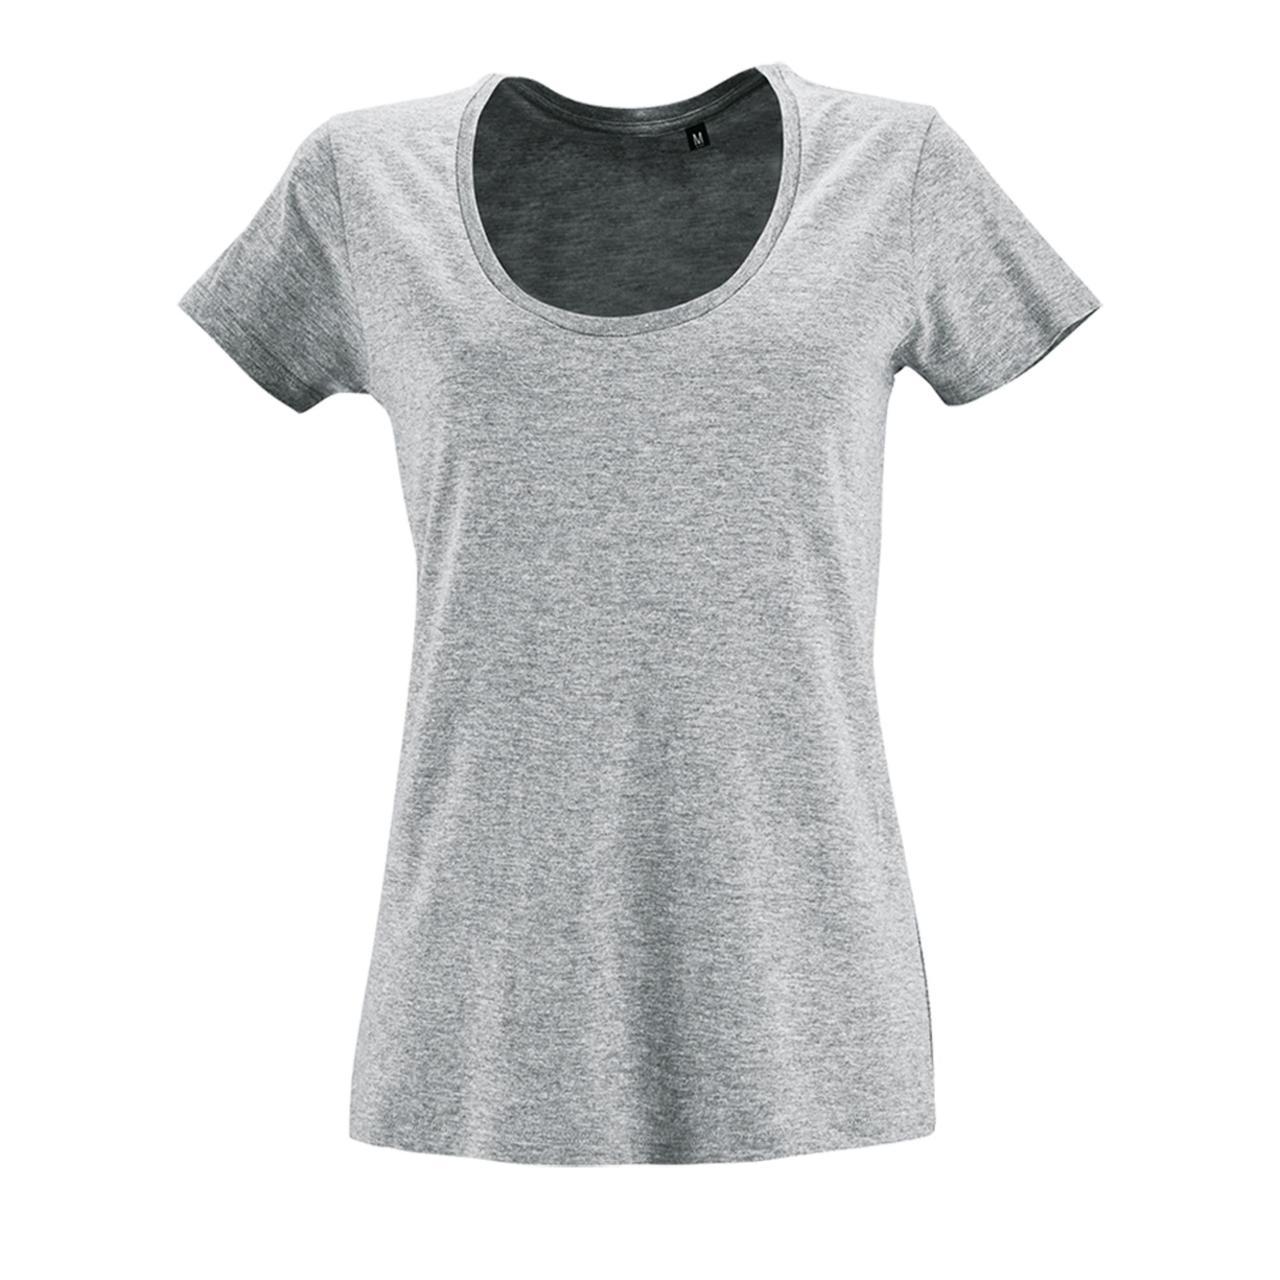 Футболка женская Metropolitan, серый меланж (артикул 02079350)